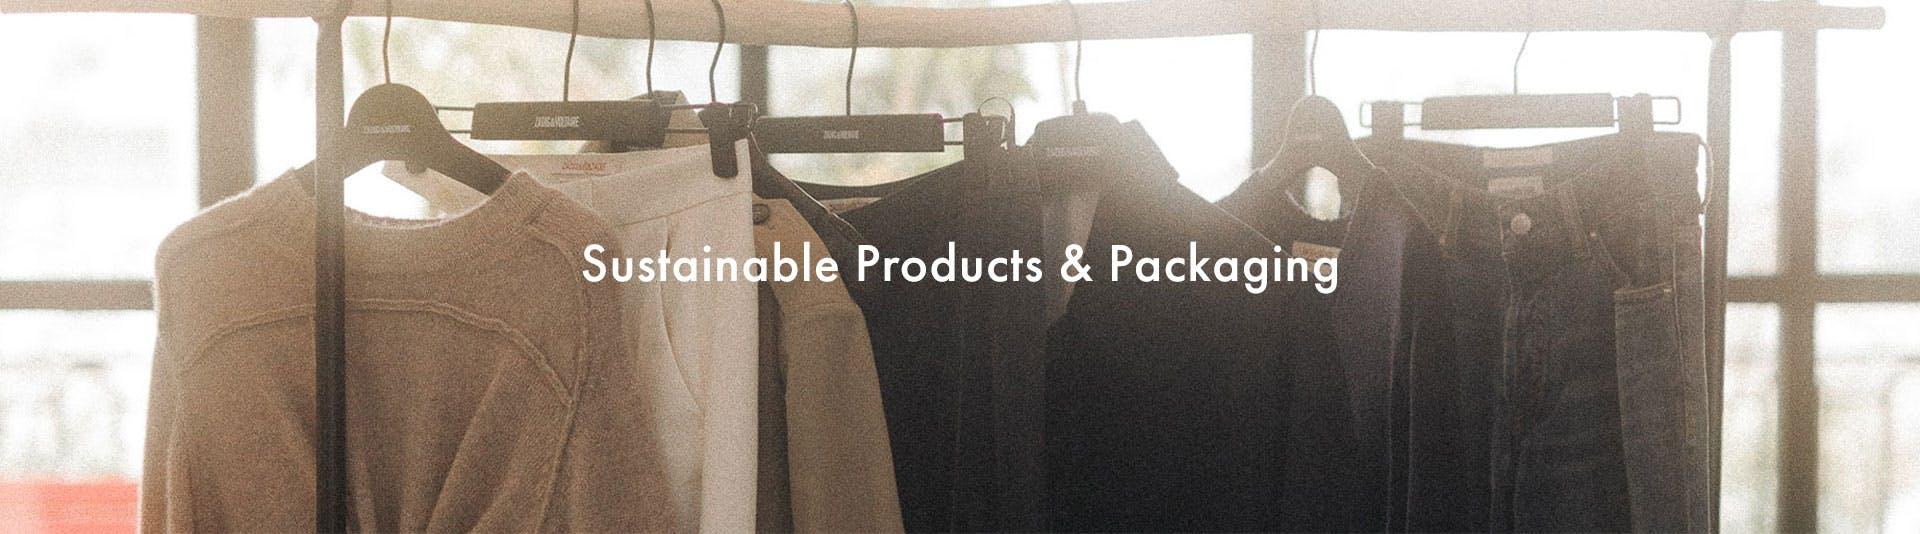 Voltaire program - sustainable products top-banner desktop